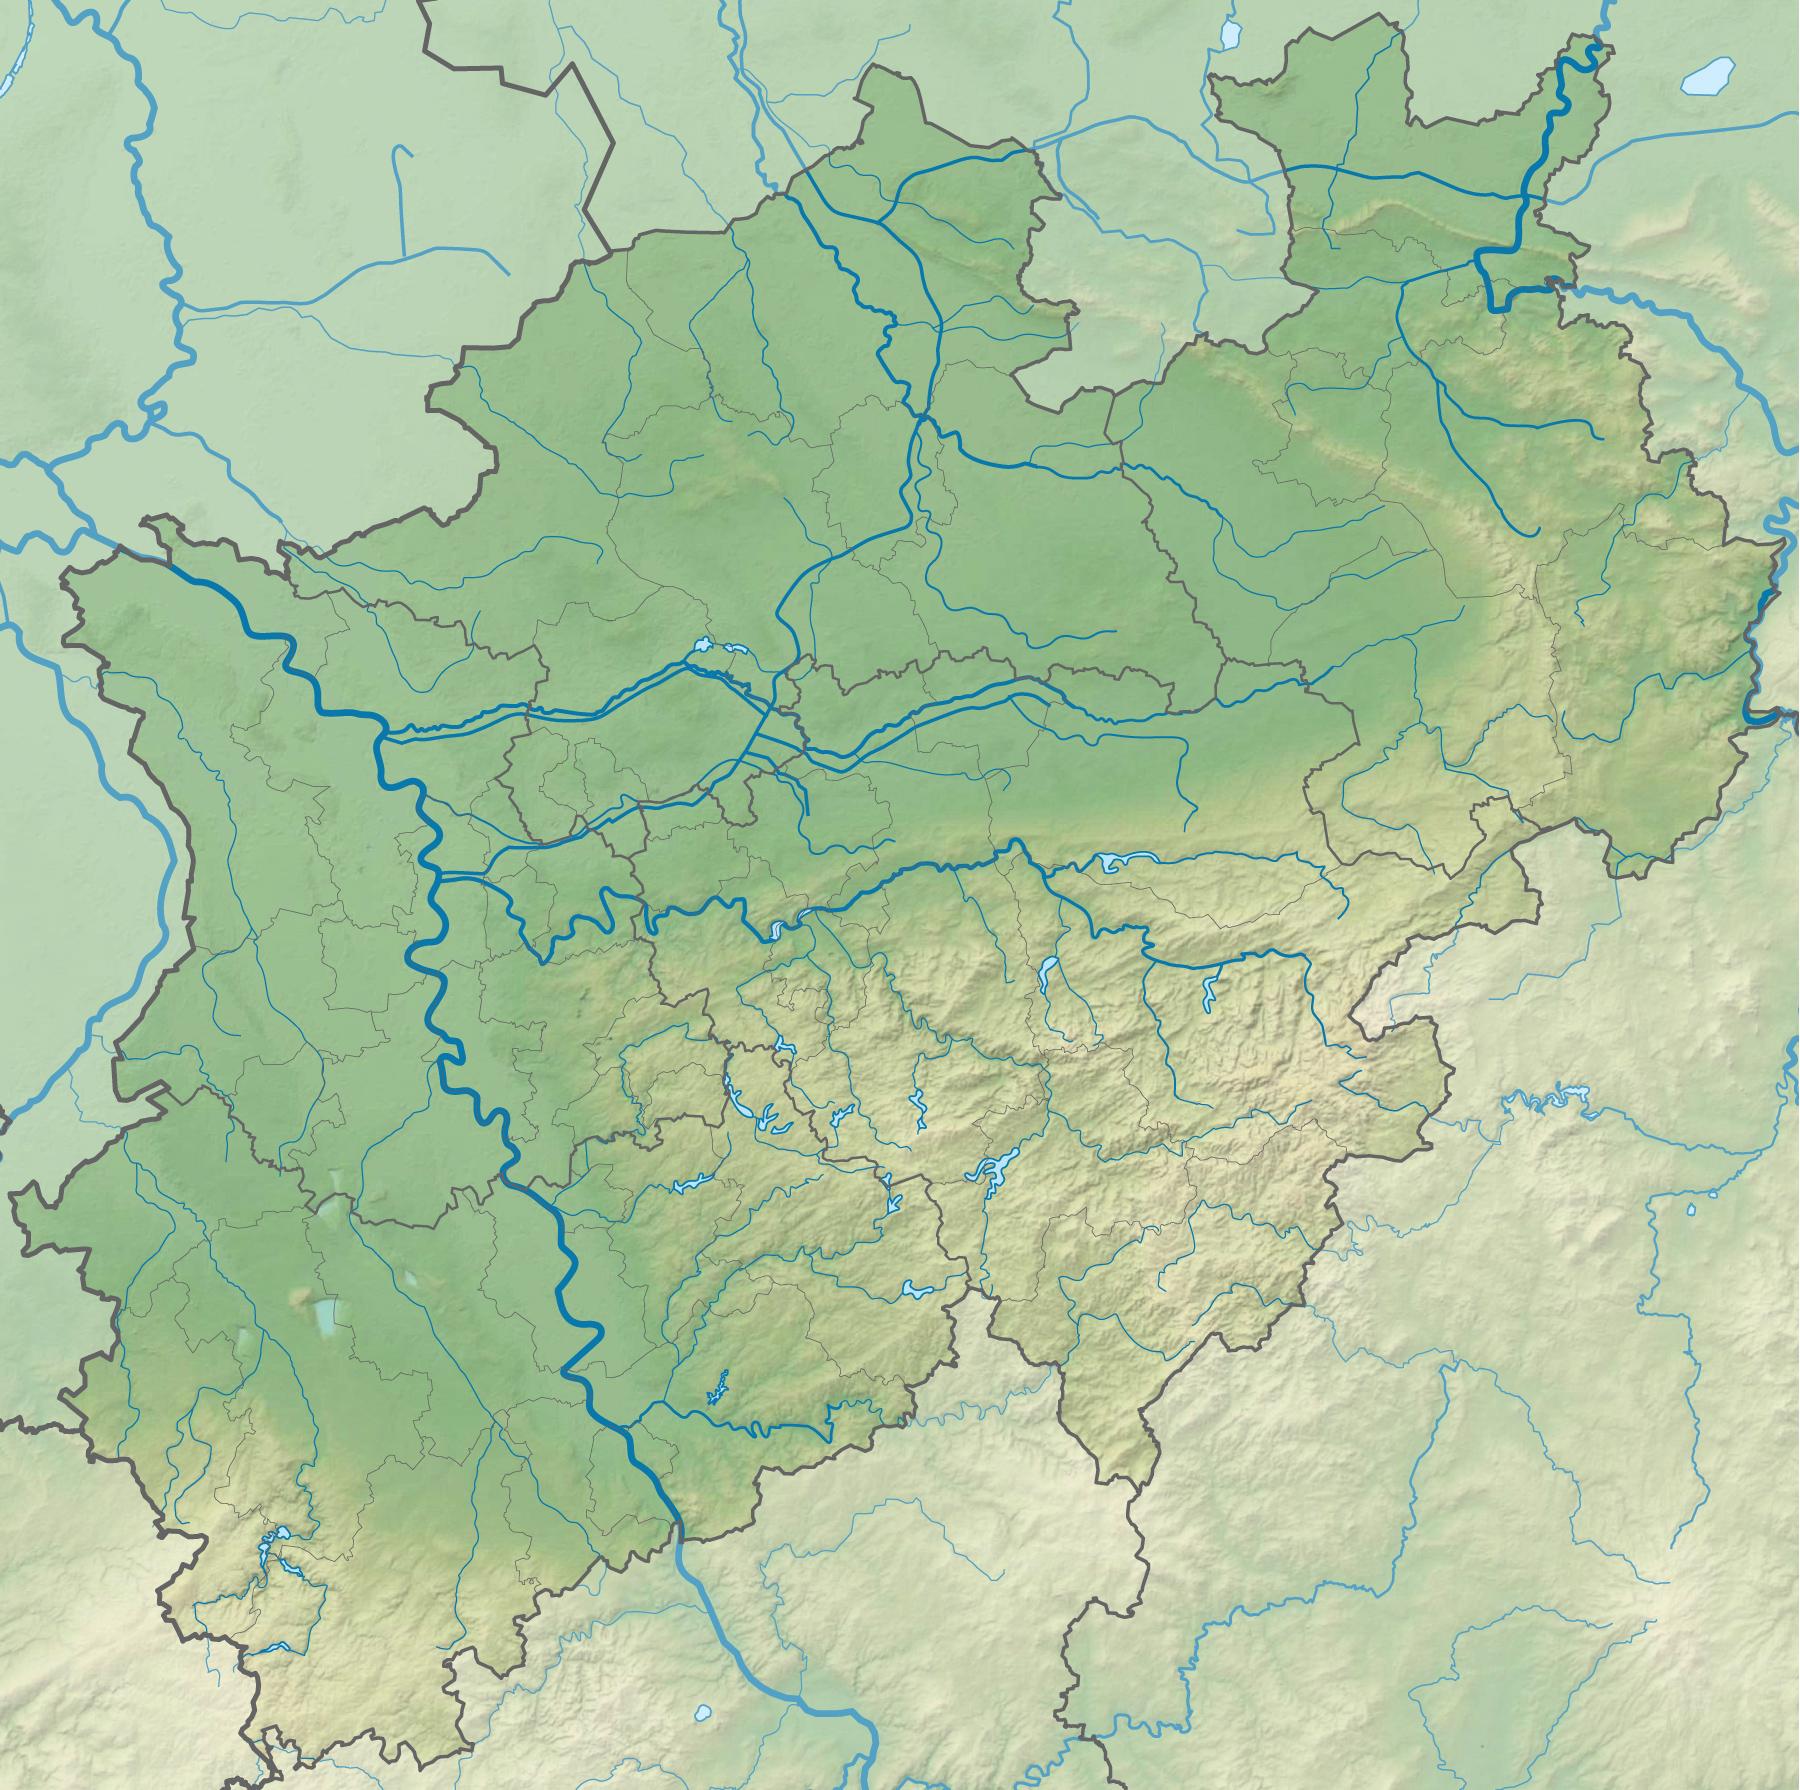 FileNorth RhineWestphalia relief location mapjpg Wikimedia Commons